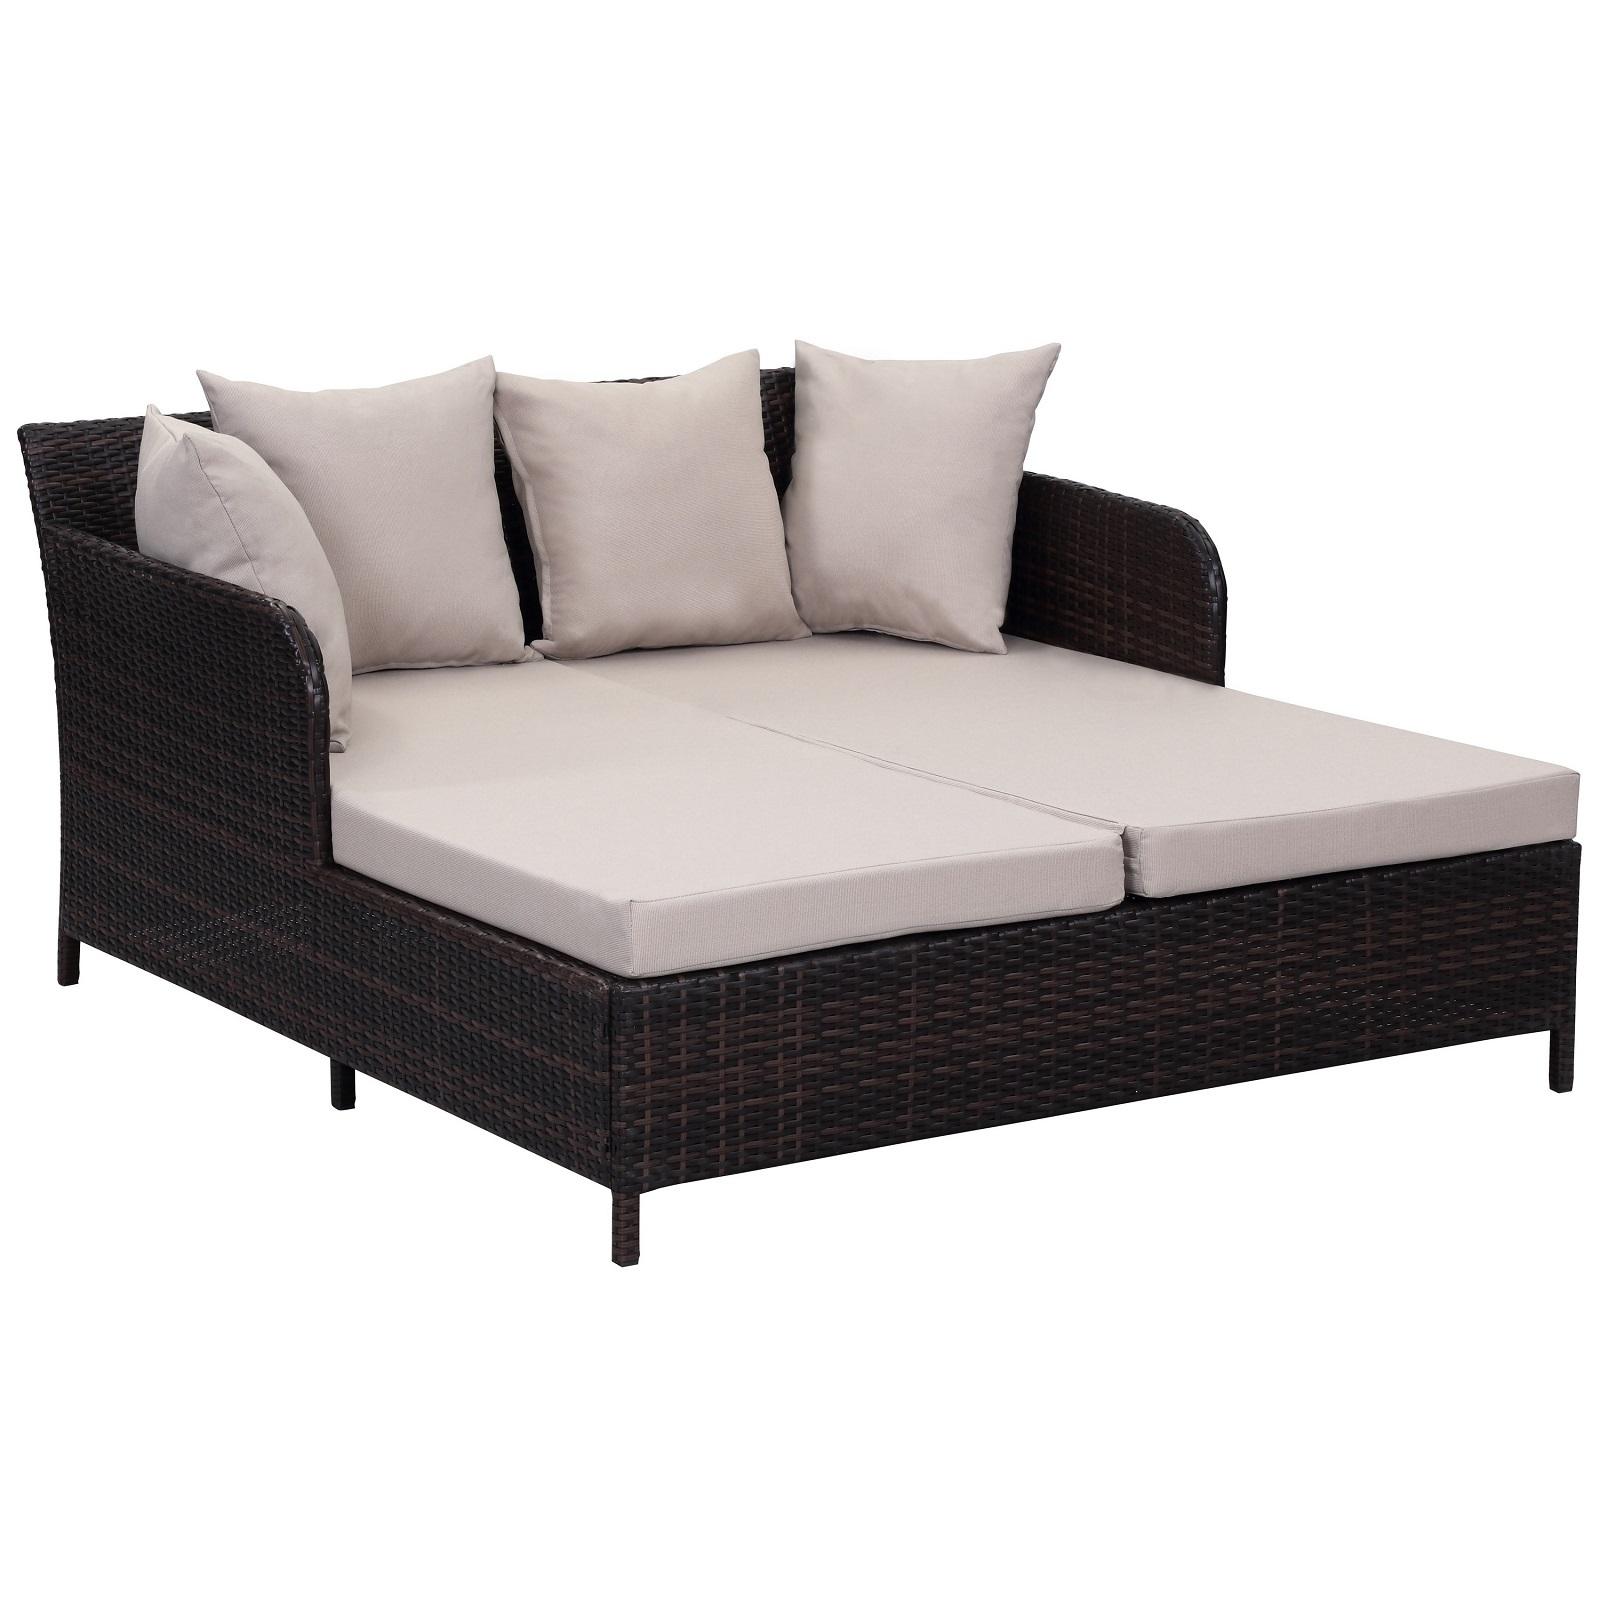 Outdoor Wicker Furniture Patio Daybed Backyard Sofa Pool